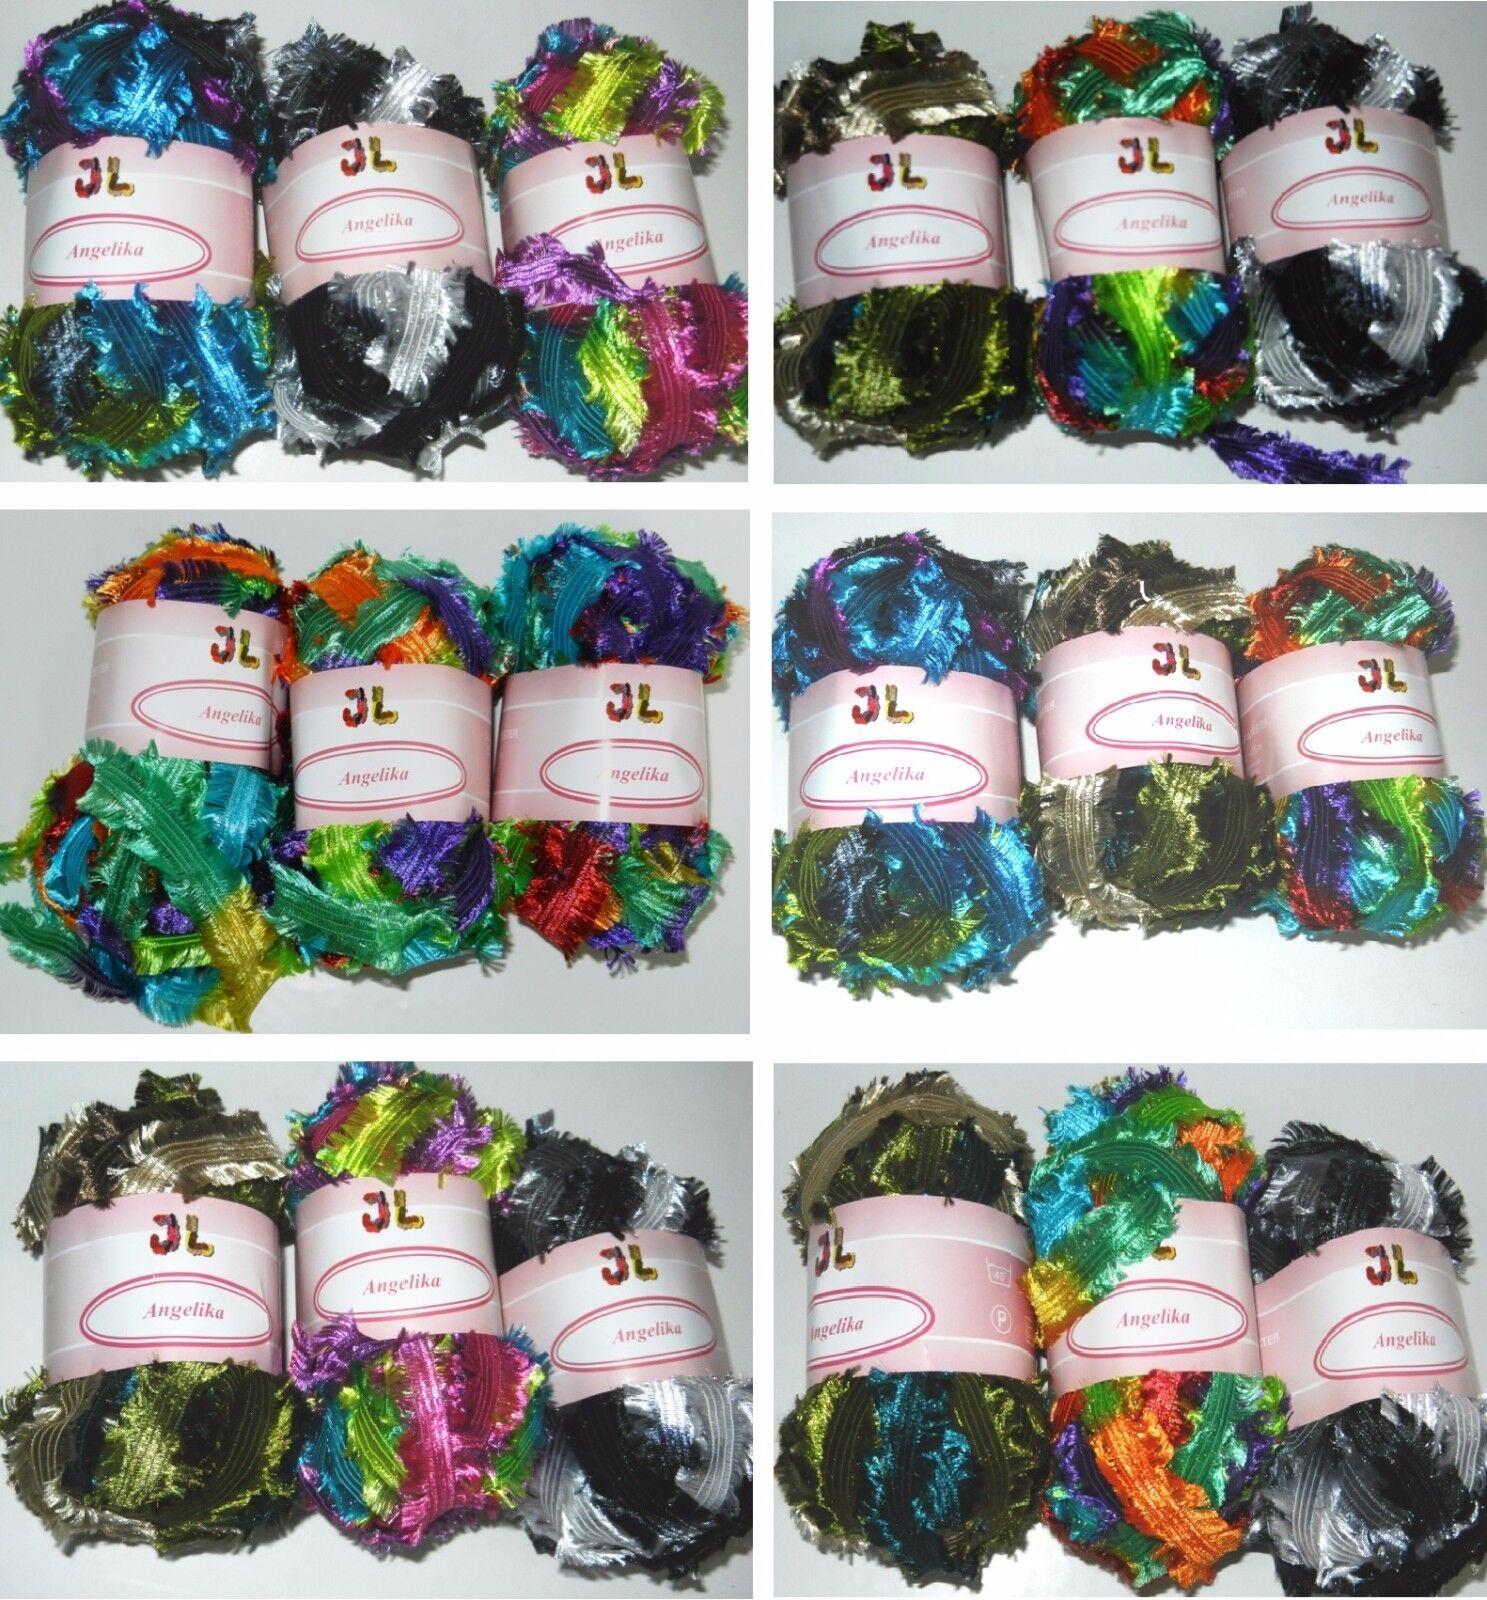 как выглядит Набор пряжи для вышивки 3 balls Fringe Ribbon Angelika shiny yarn YOUR CHOICE фото